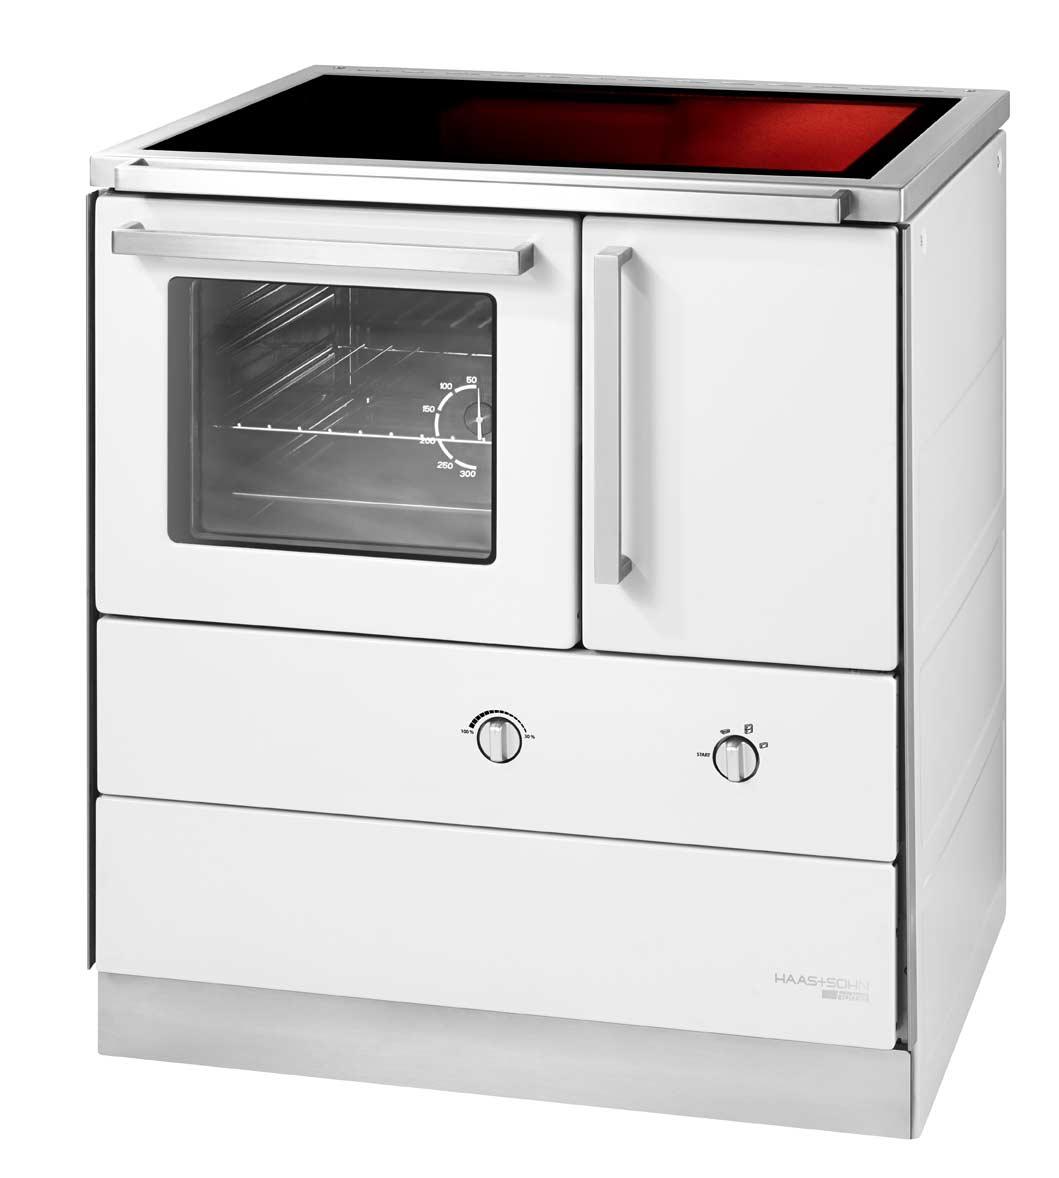 k chenherd haas sohn hsdz 75 5 c easy wei cerankochfeld ans links bei. Black Bedroom Furniture Sets. Home Design Ideas